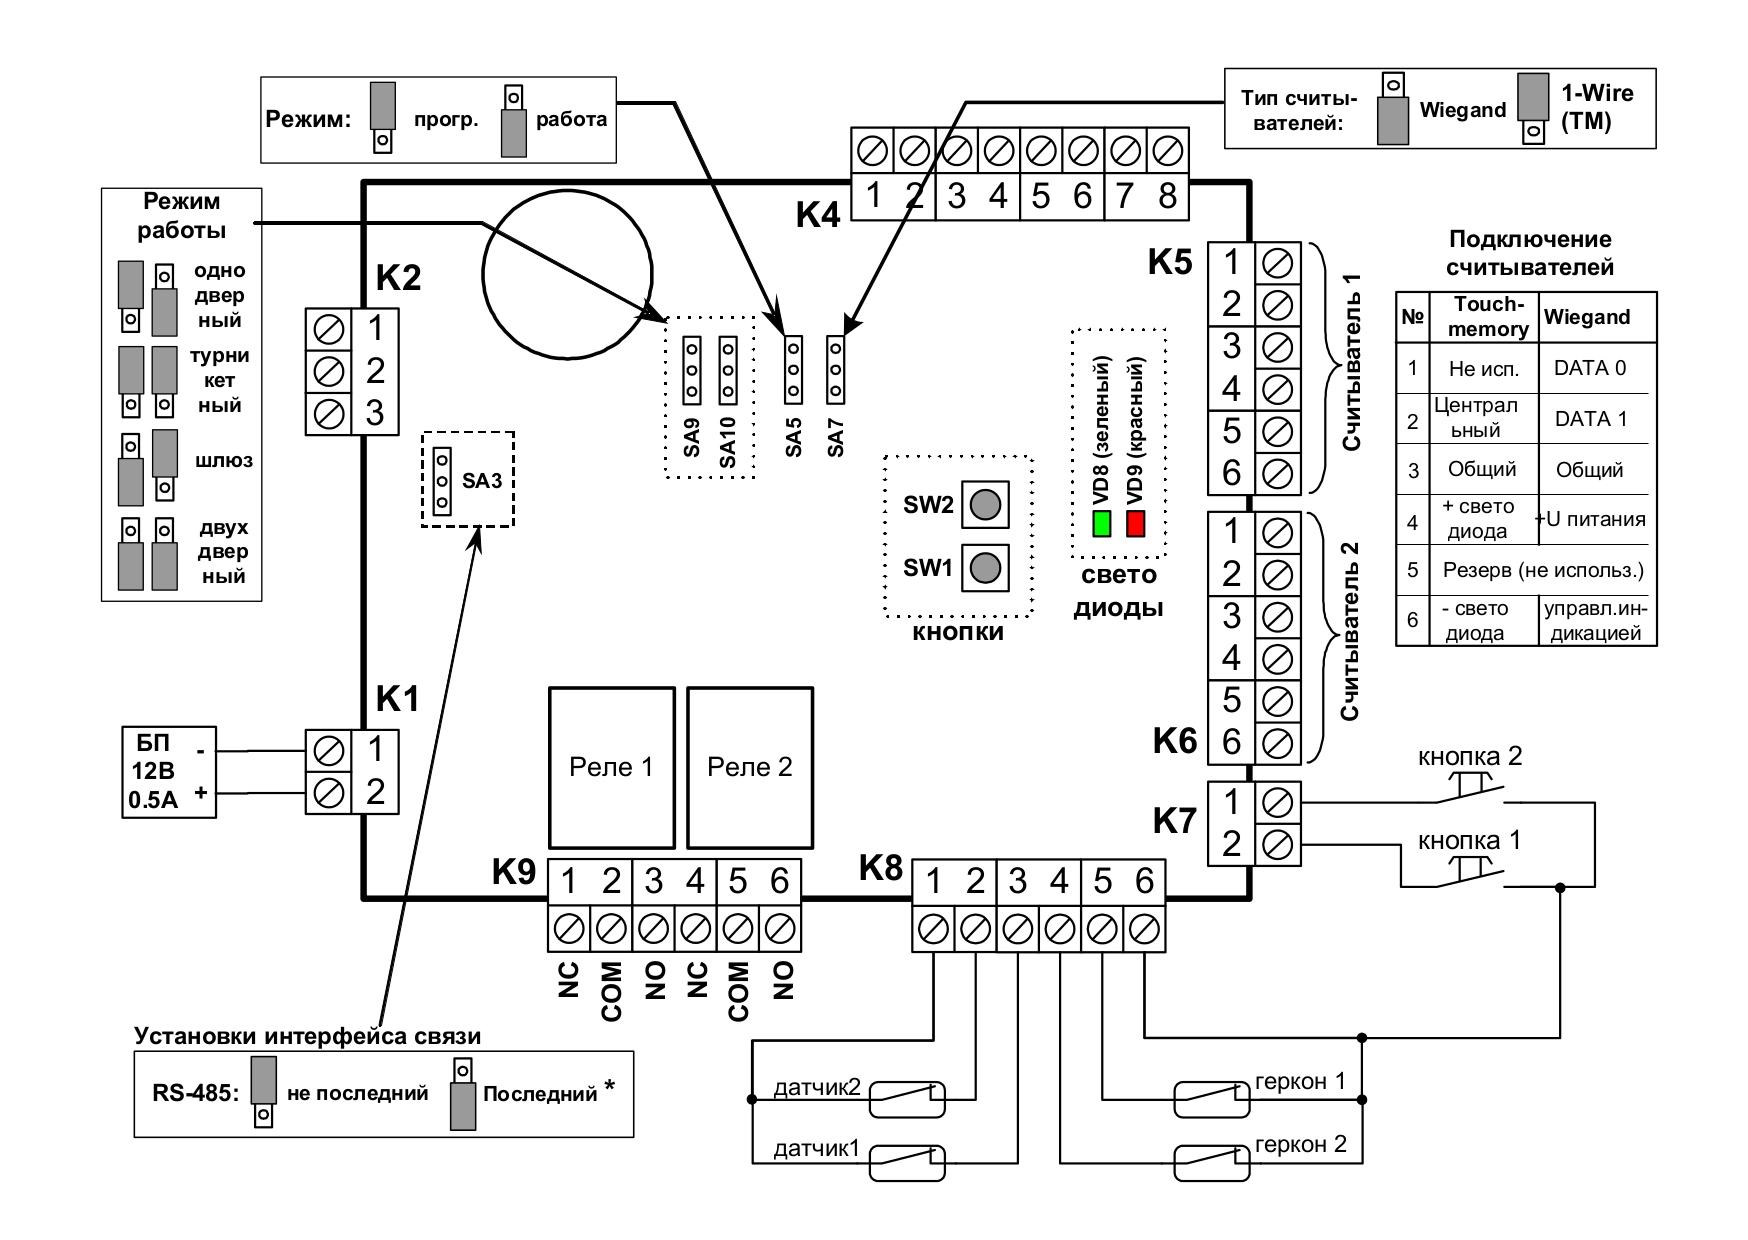 1-wire- электрическая схема